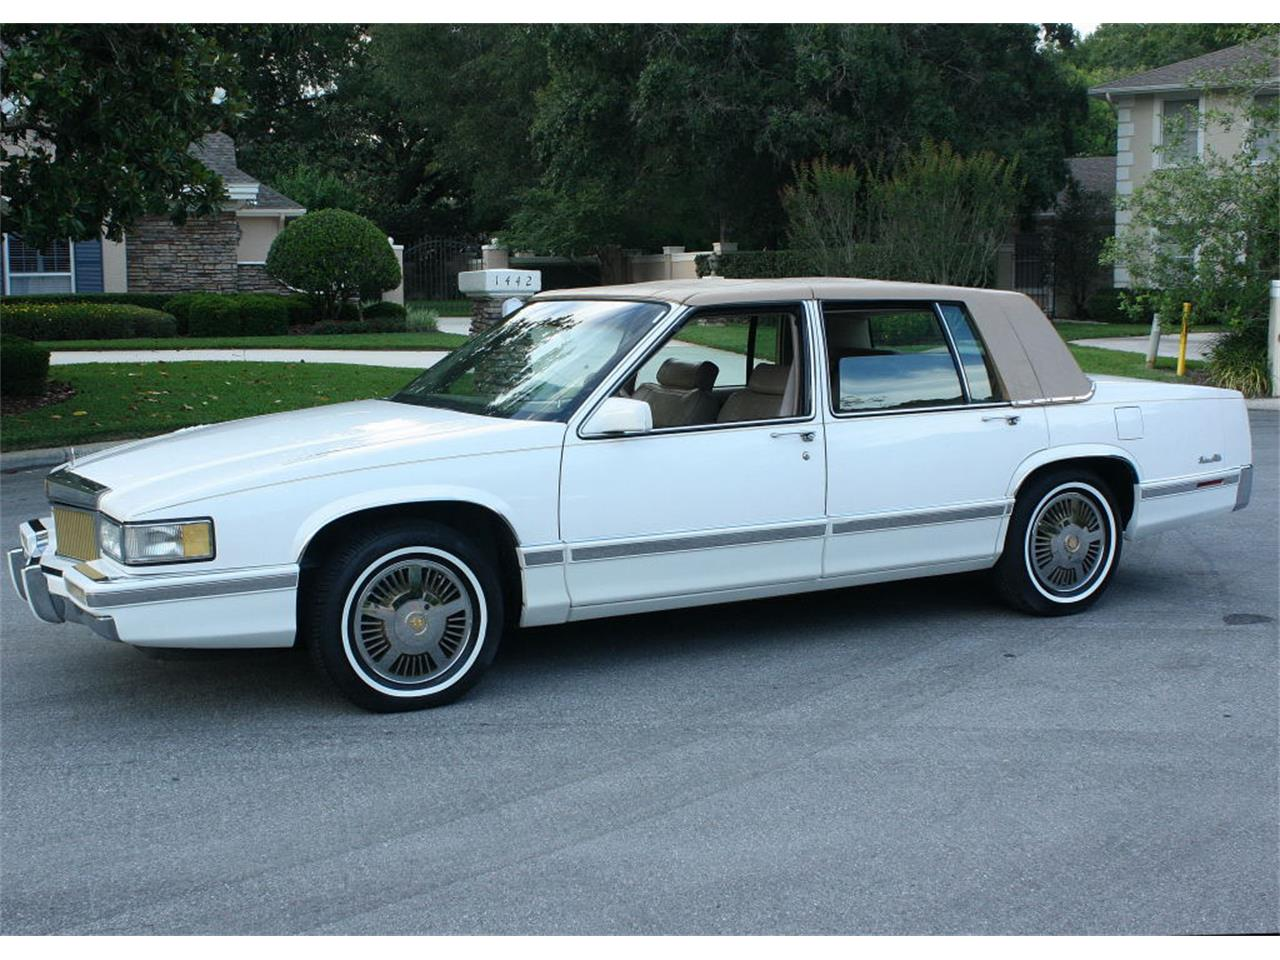 Large Picture of '91 Sedan - $9,500.00 - L5XM